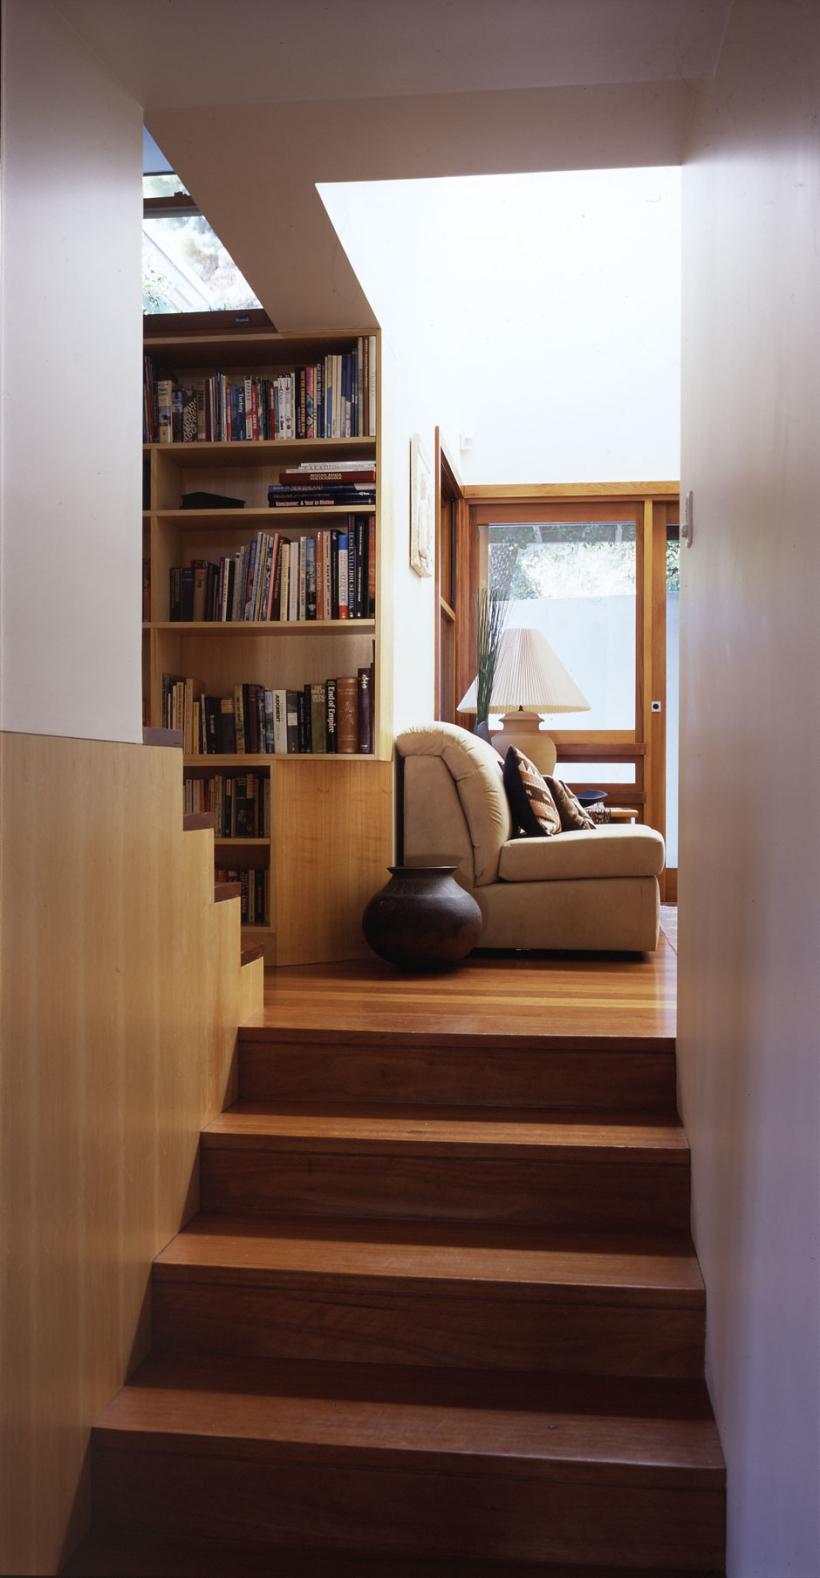 House-at-Mosman_Stairs-820x1578.jpg